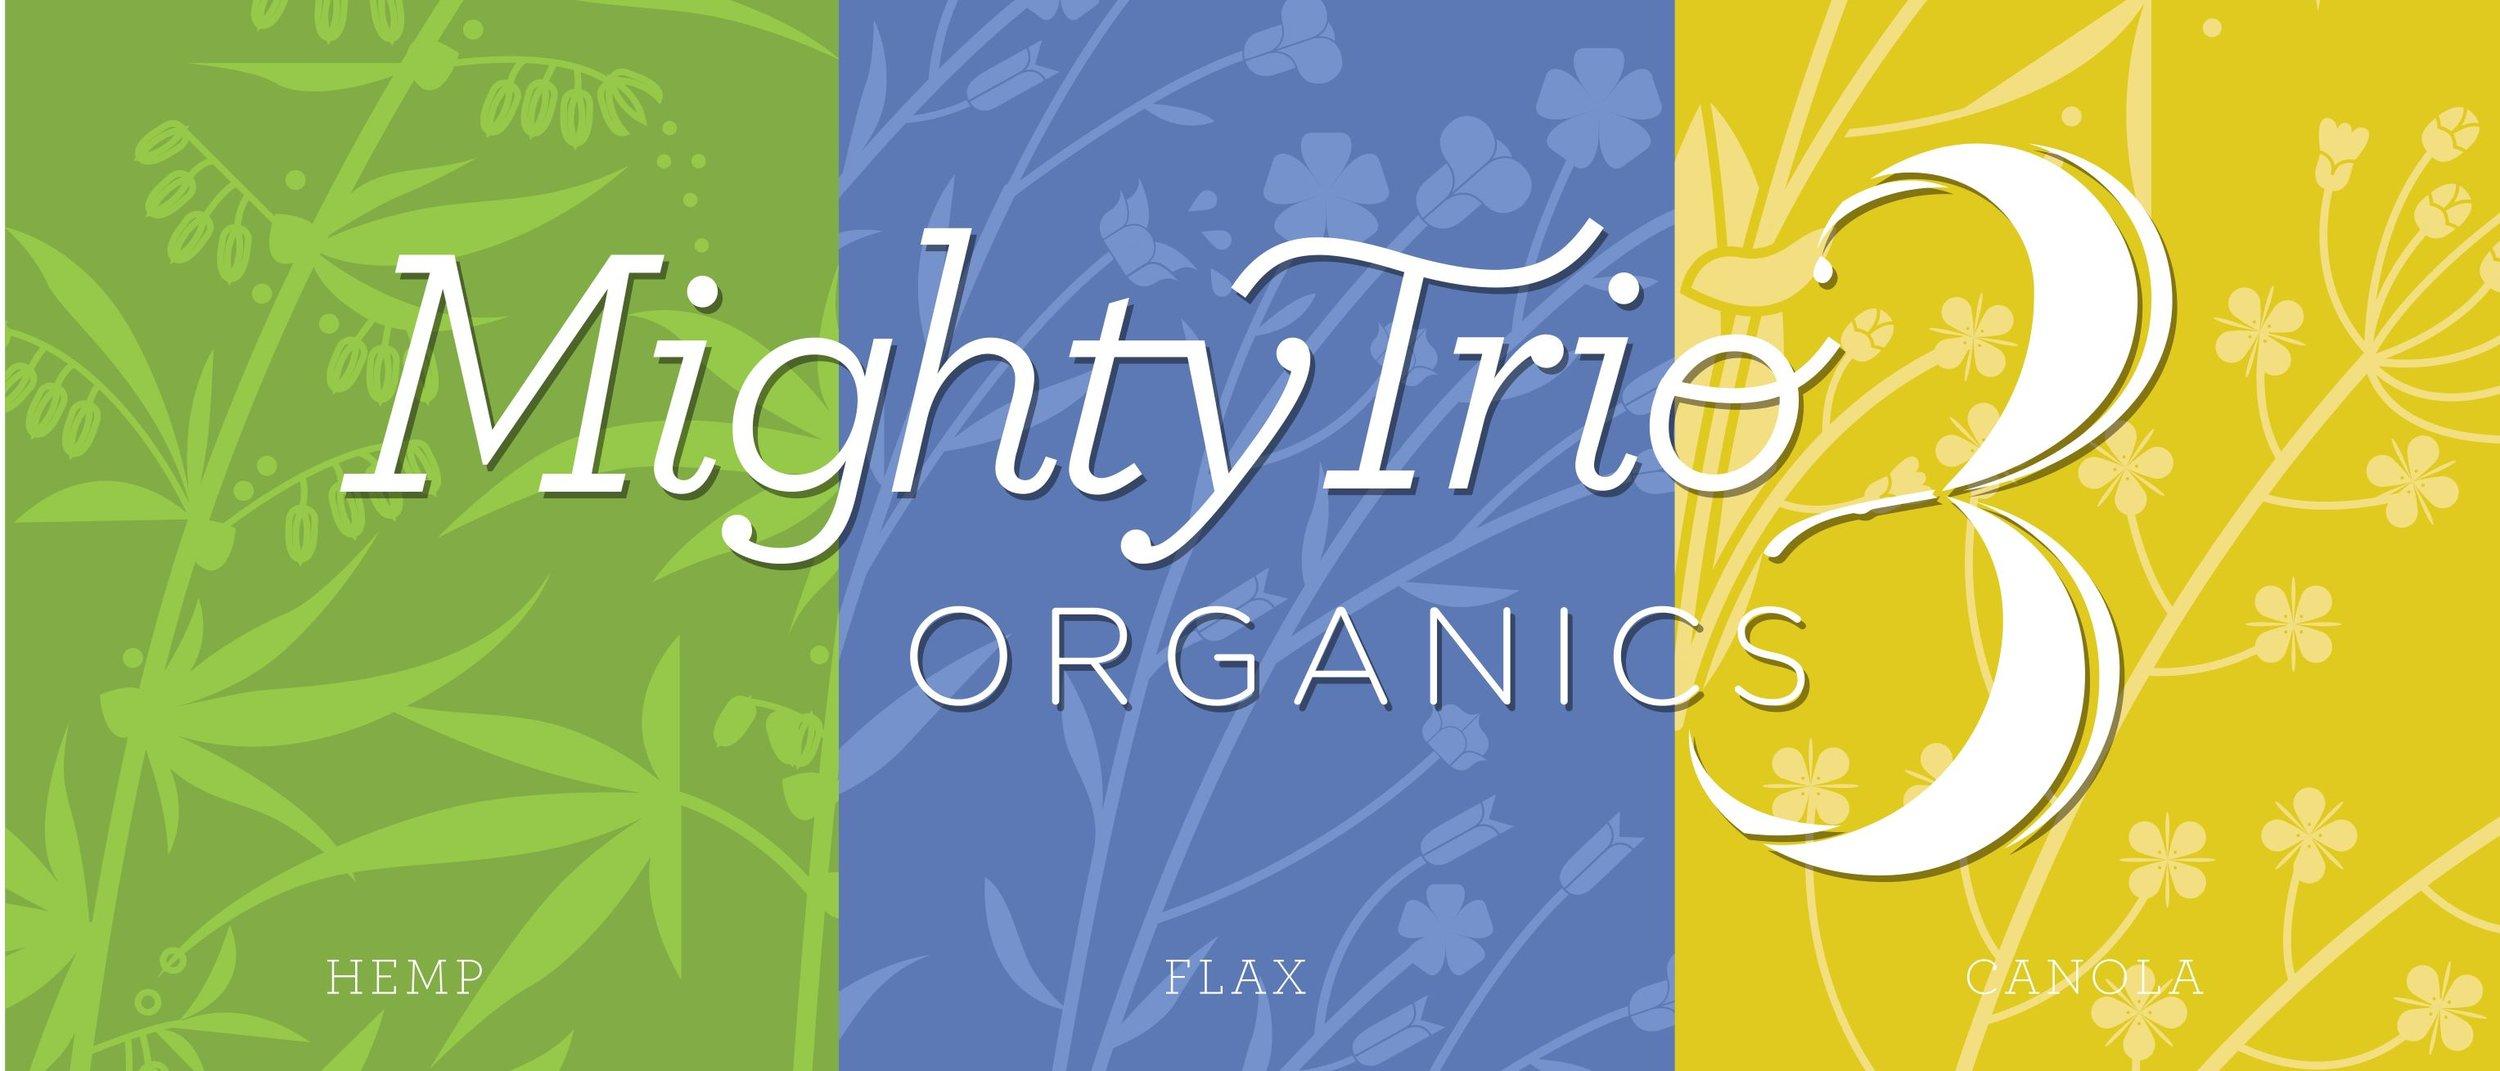 Mighty Trio Organics